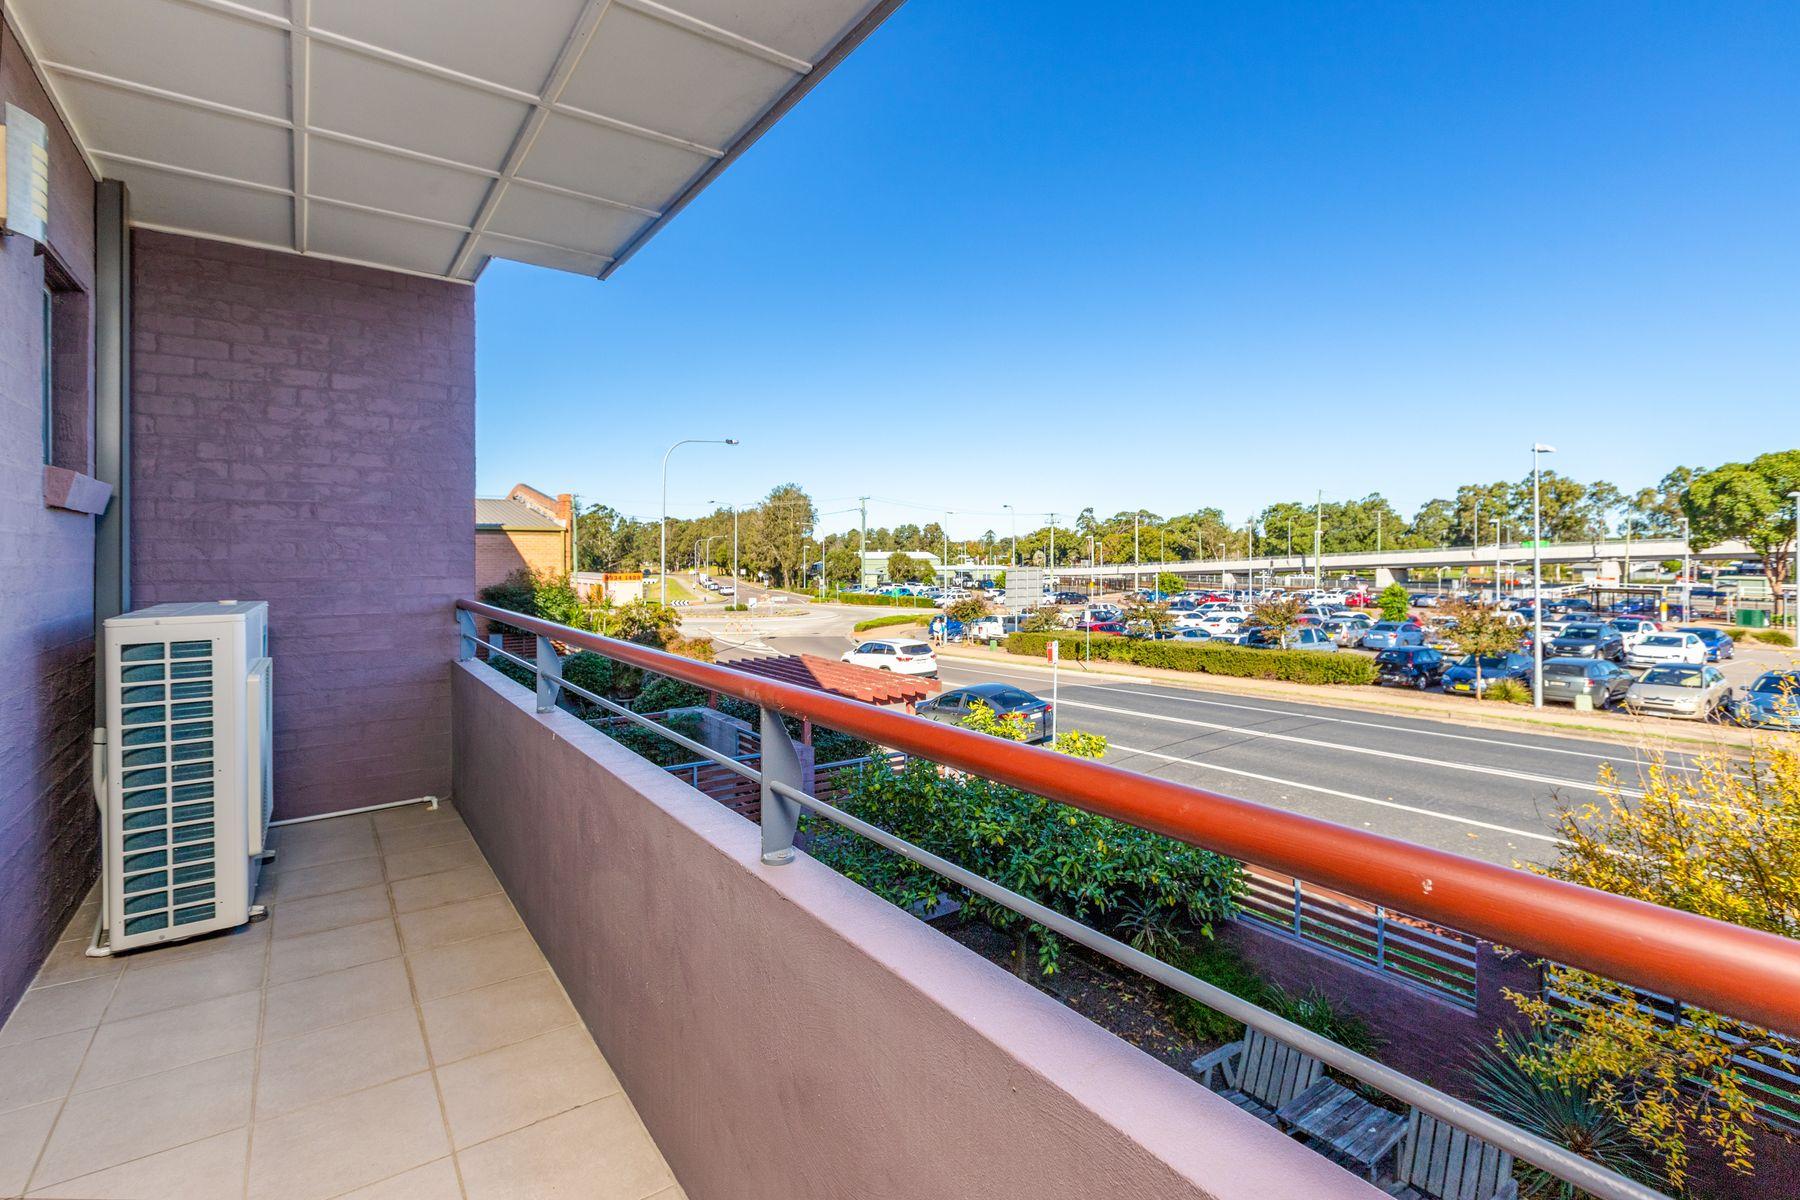 2/14 Railway Street, Maitland, NSW 2320